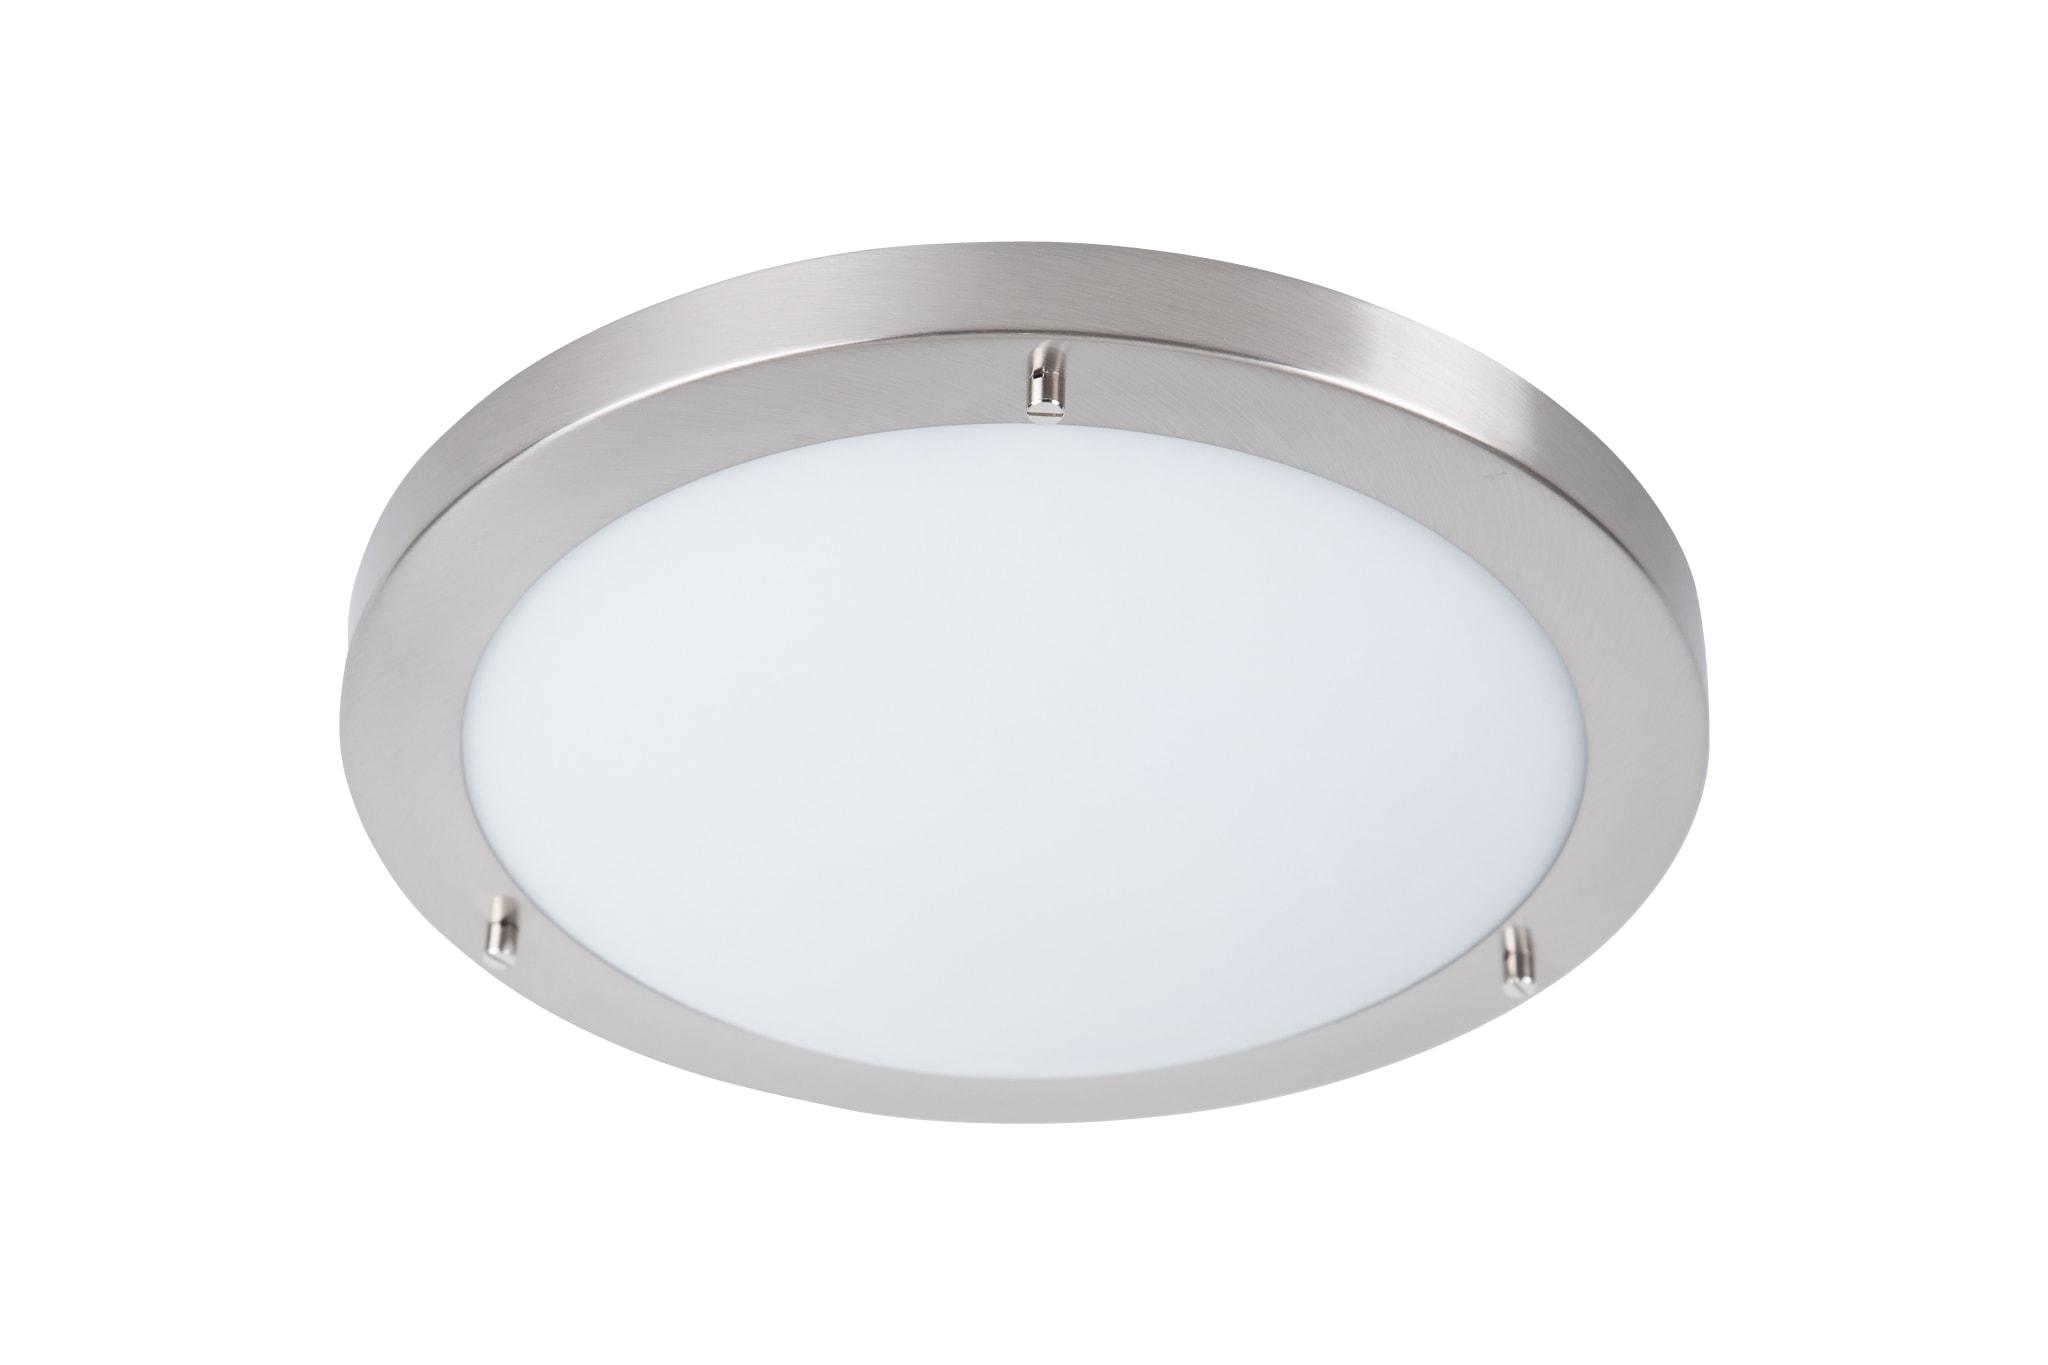 Modern Led Bathroom Ceiling Light Chrome Finish Ip44 Rated: Brushed Chrome Modern 16W Bathroom Flush Ceiling Light